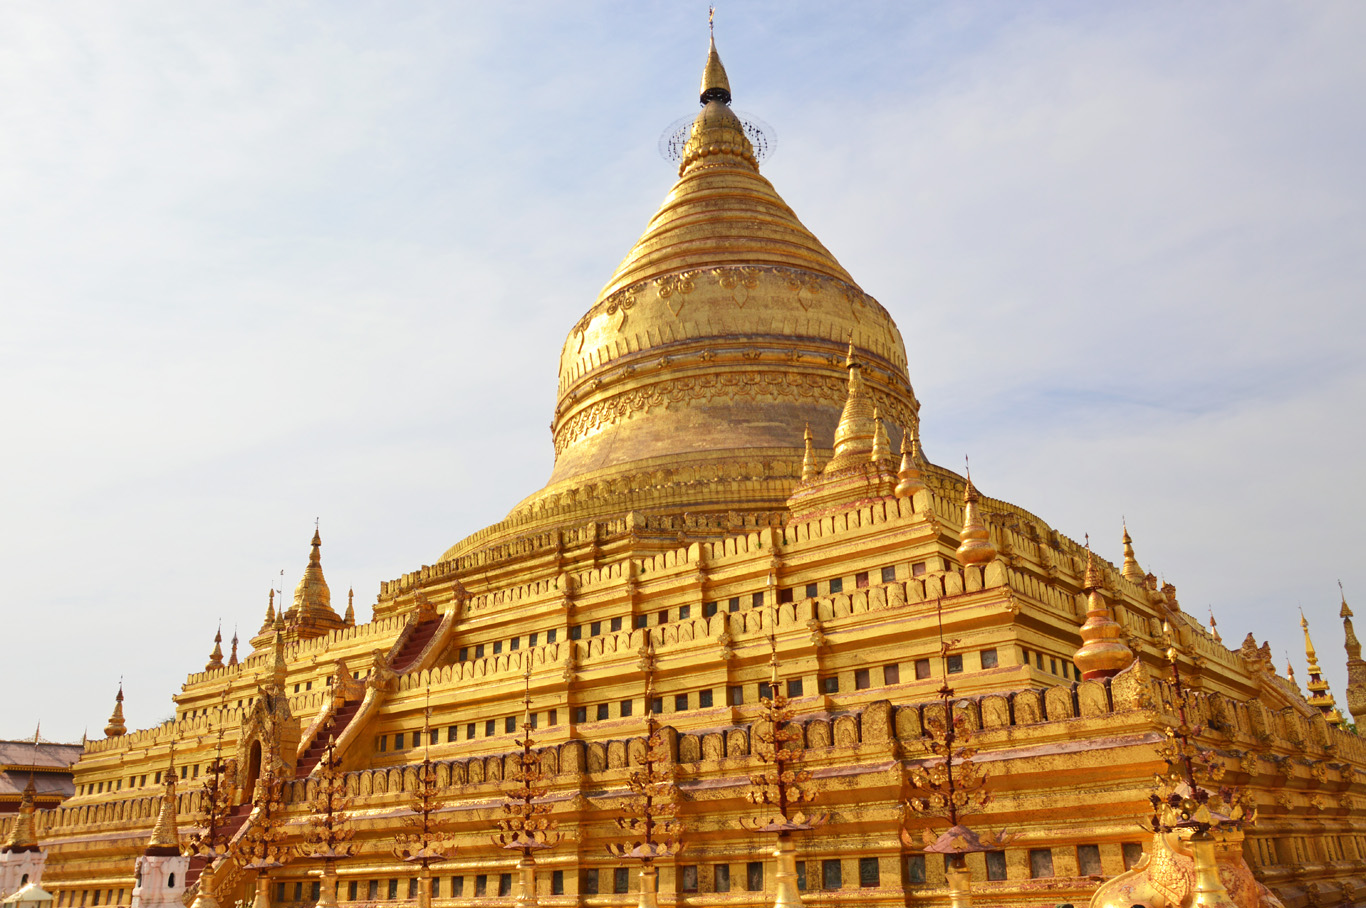 Golden stupa at Shwezigon Temple